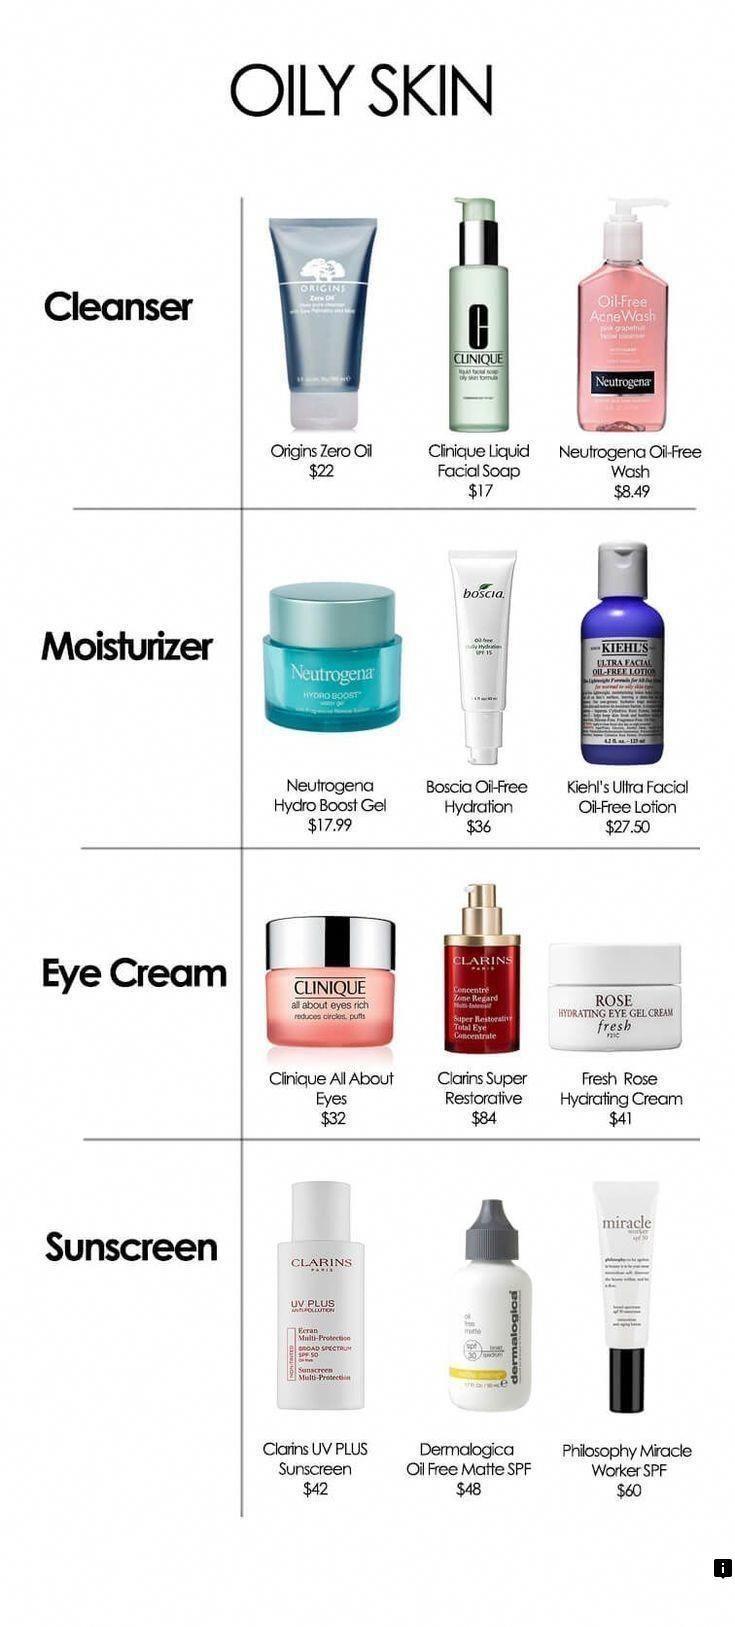 Marvelous Diy Ideas Skin Care For Black Women Ideas Skin Care Tips Over 40 Anti Aging Moisturizer In 2020 Anti Aging Skin Products Oily Skin Care Anti Aging Skin Care